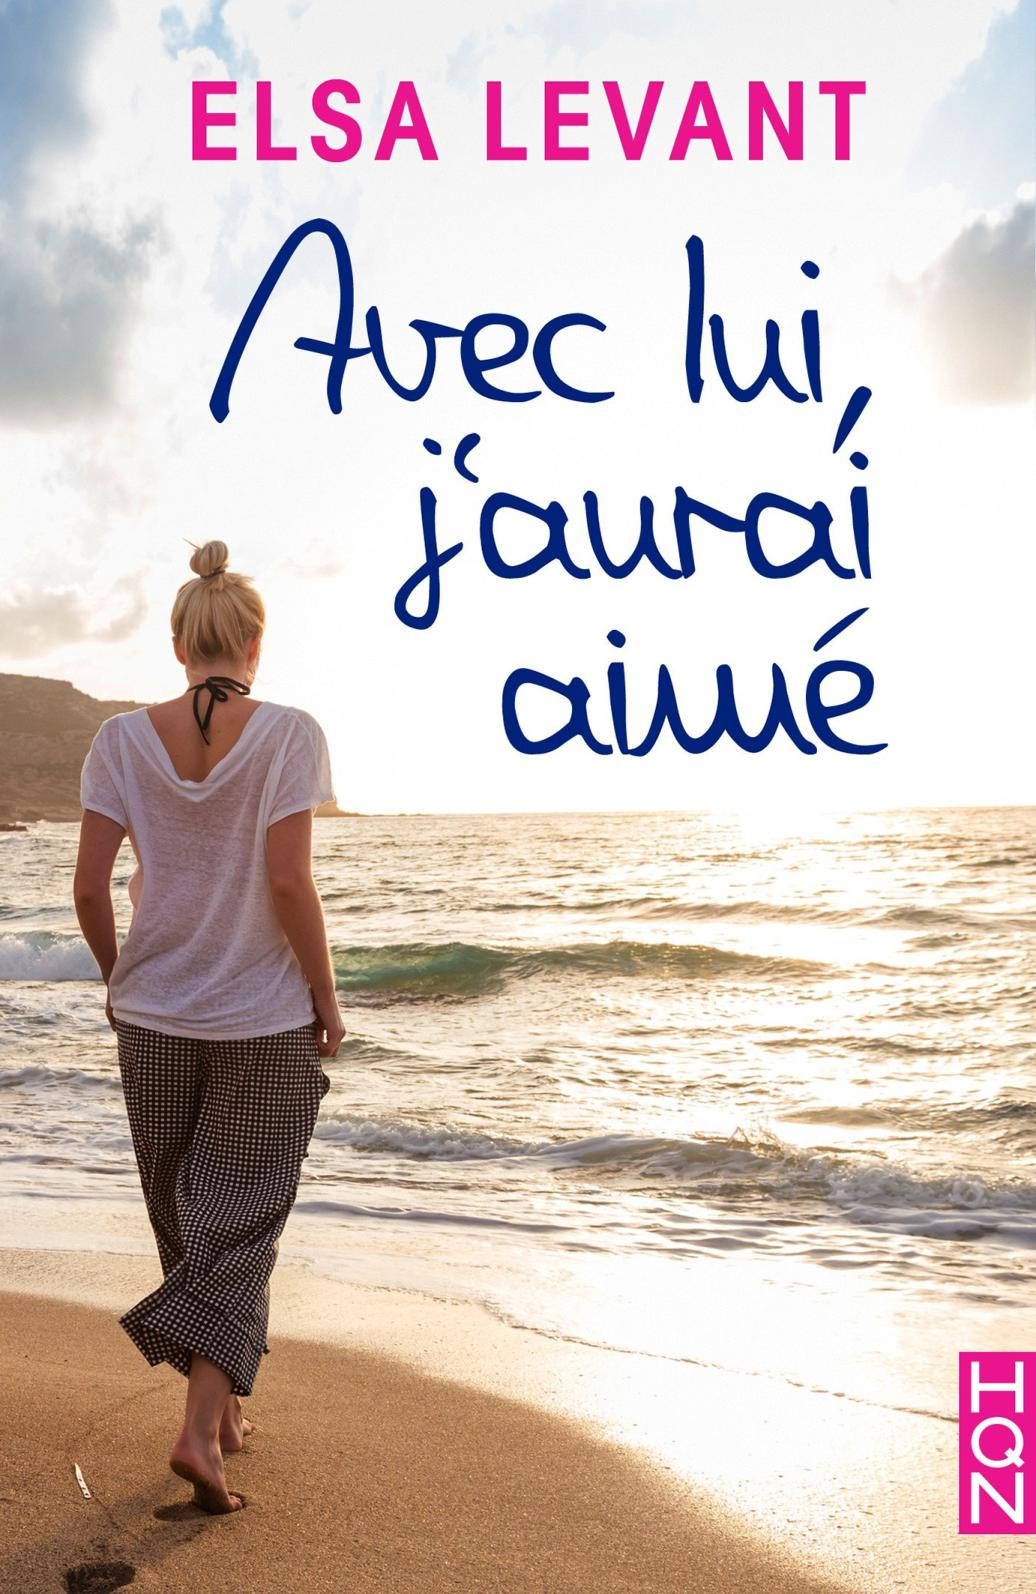 Calaméo LuiJ'aurai Levant Avec Aimé Elsa vmNn0wO8